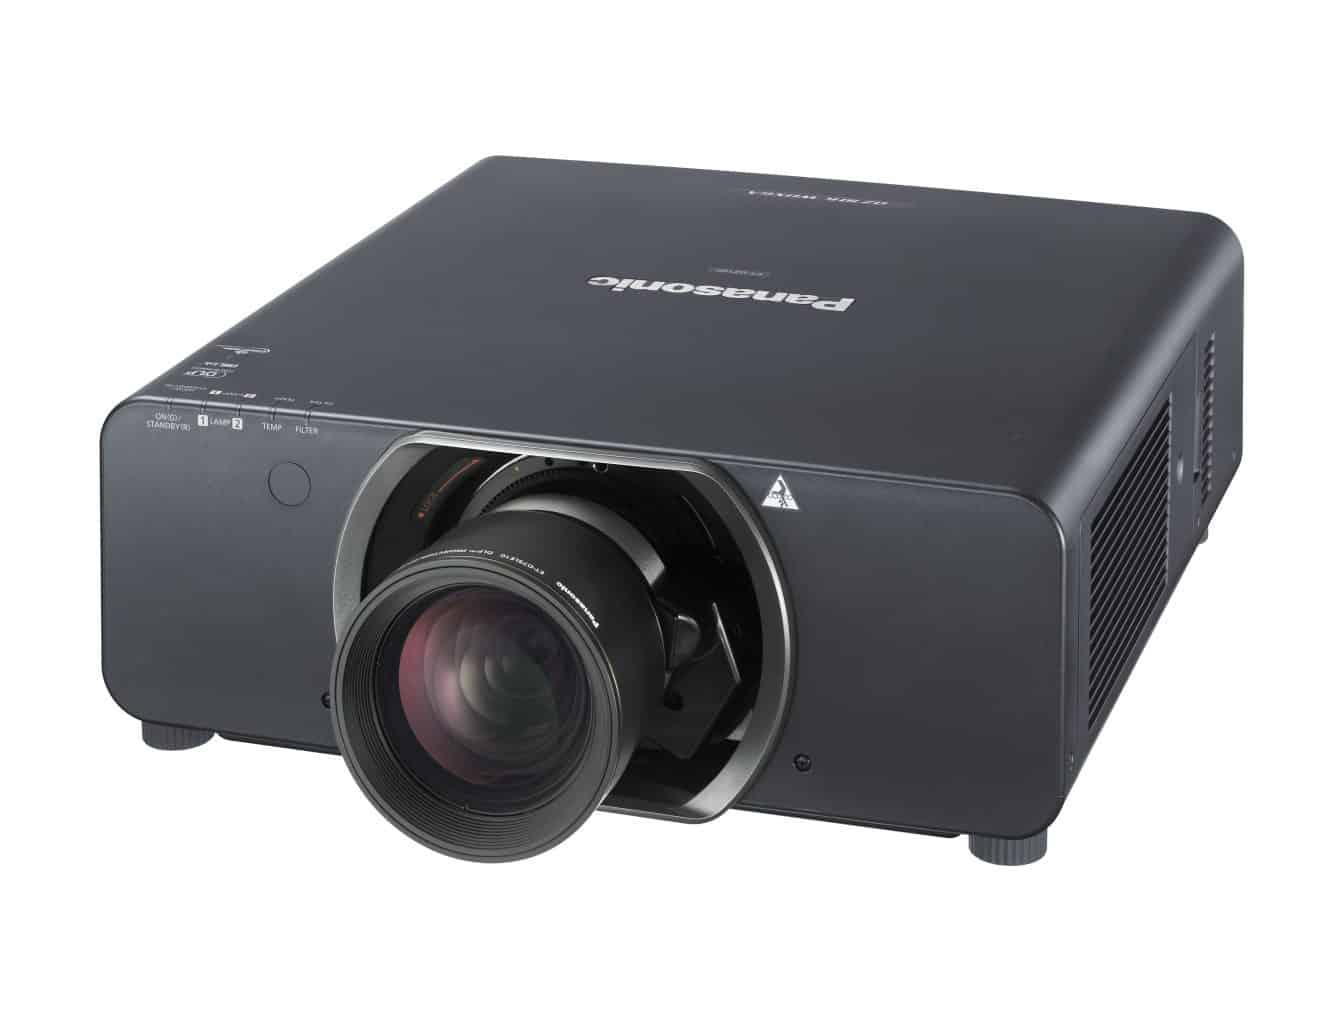 Panasonic Projector hire PT DZ 110 WUXGA